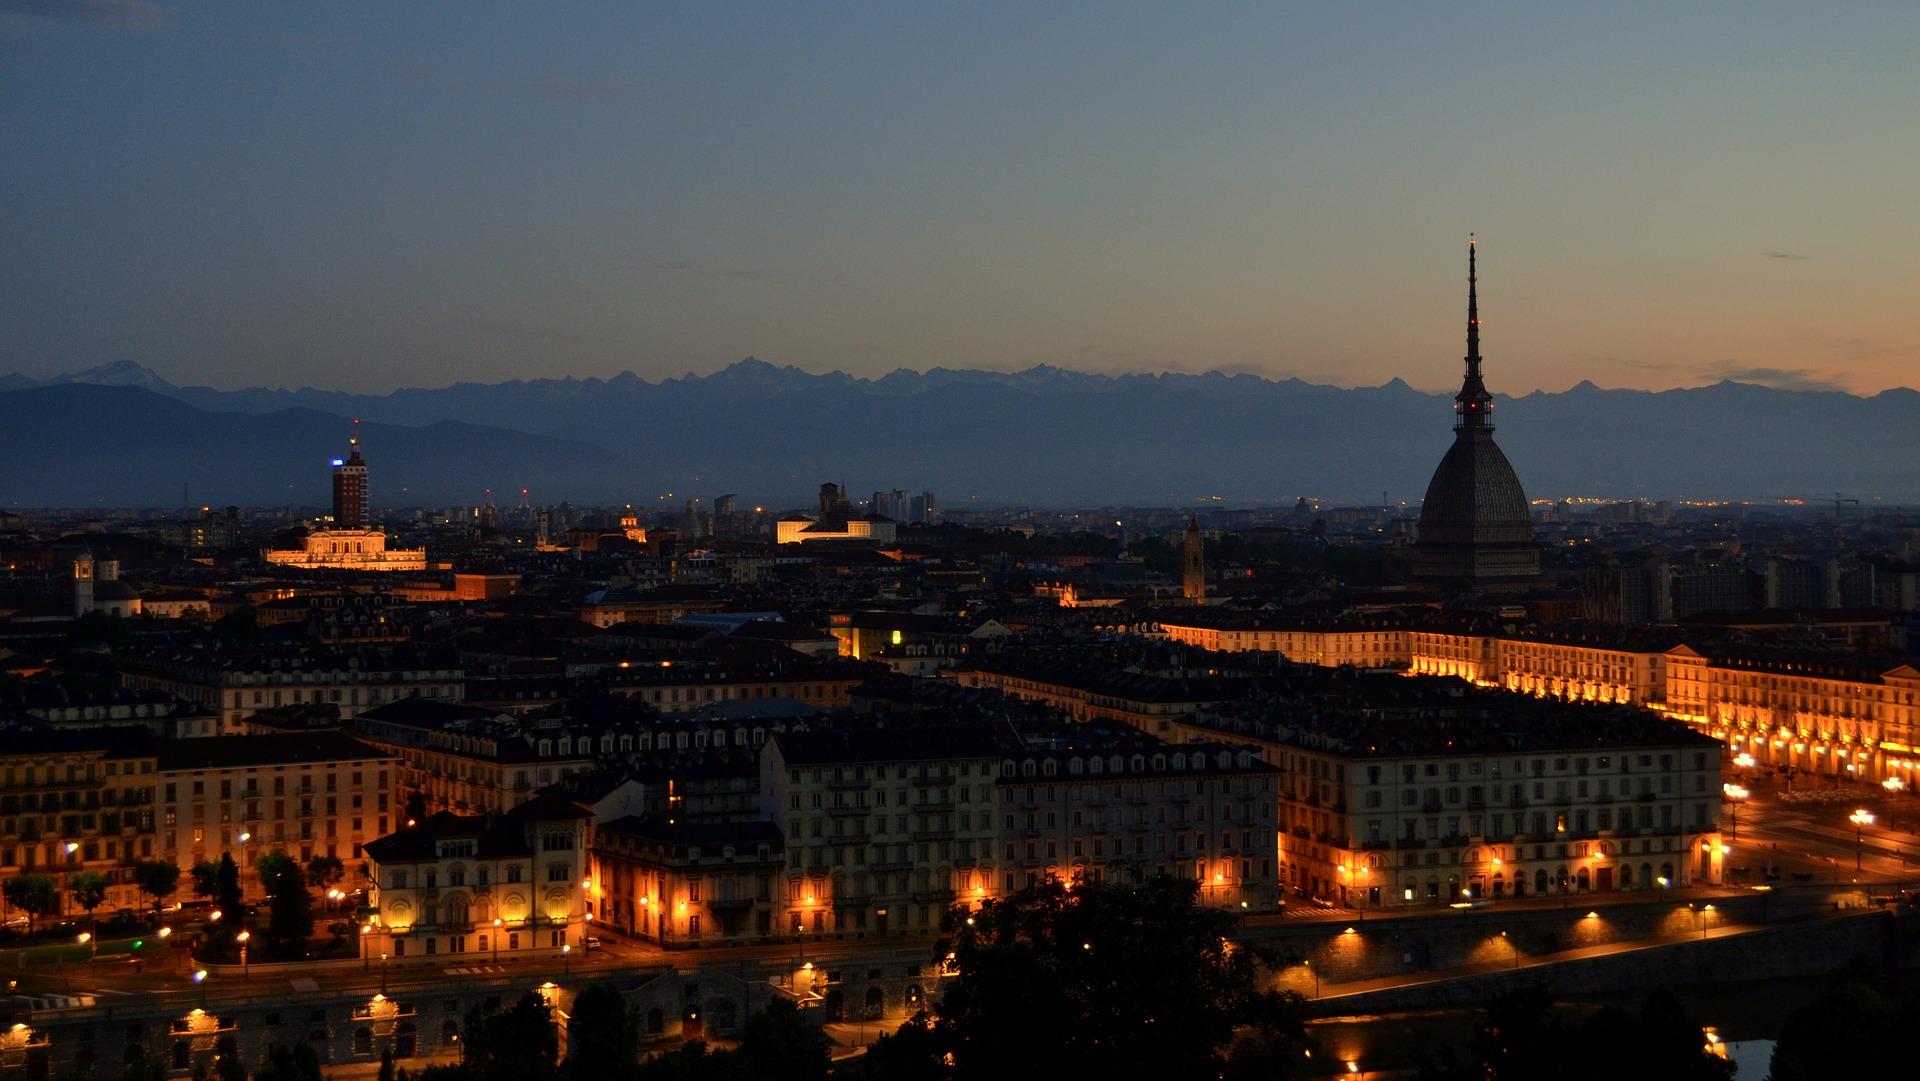 Misure anti movida in Piemonte